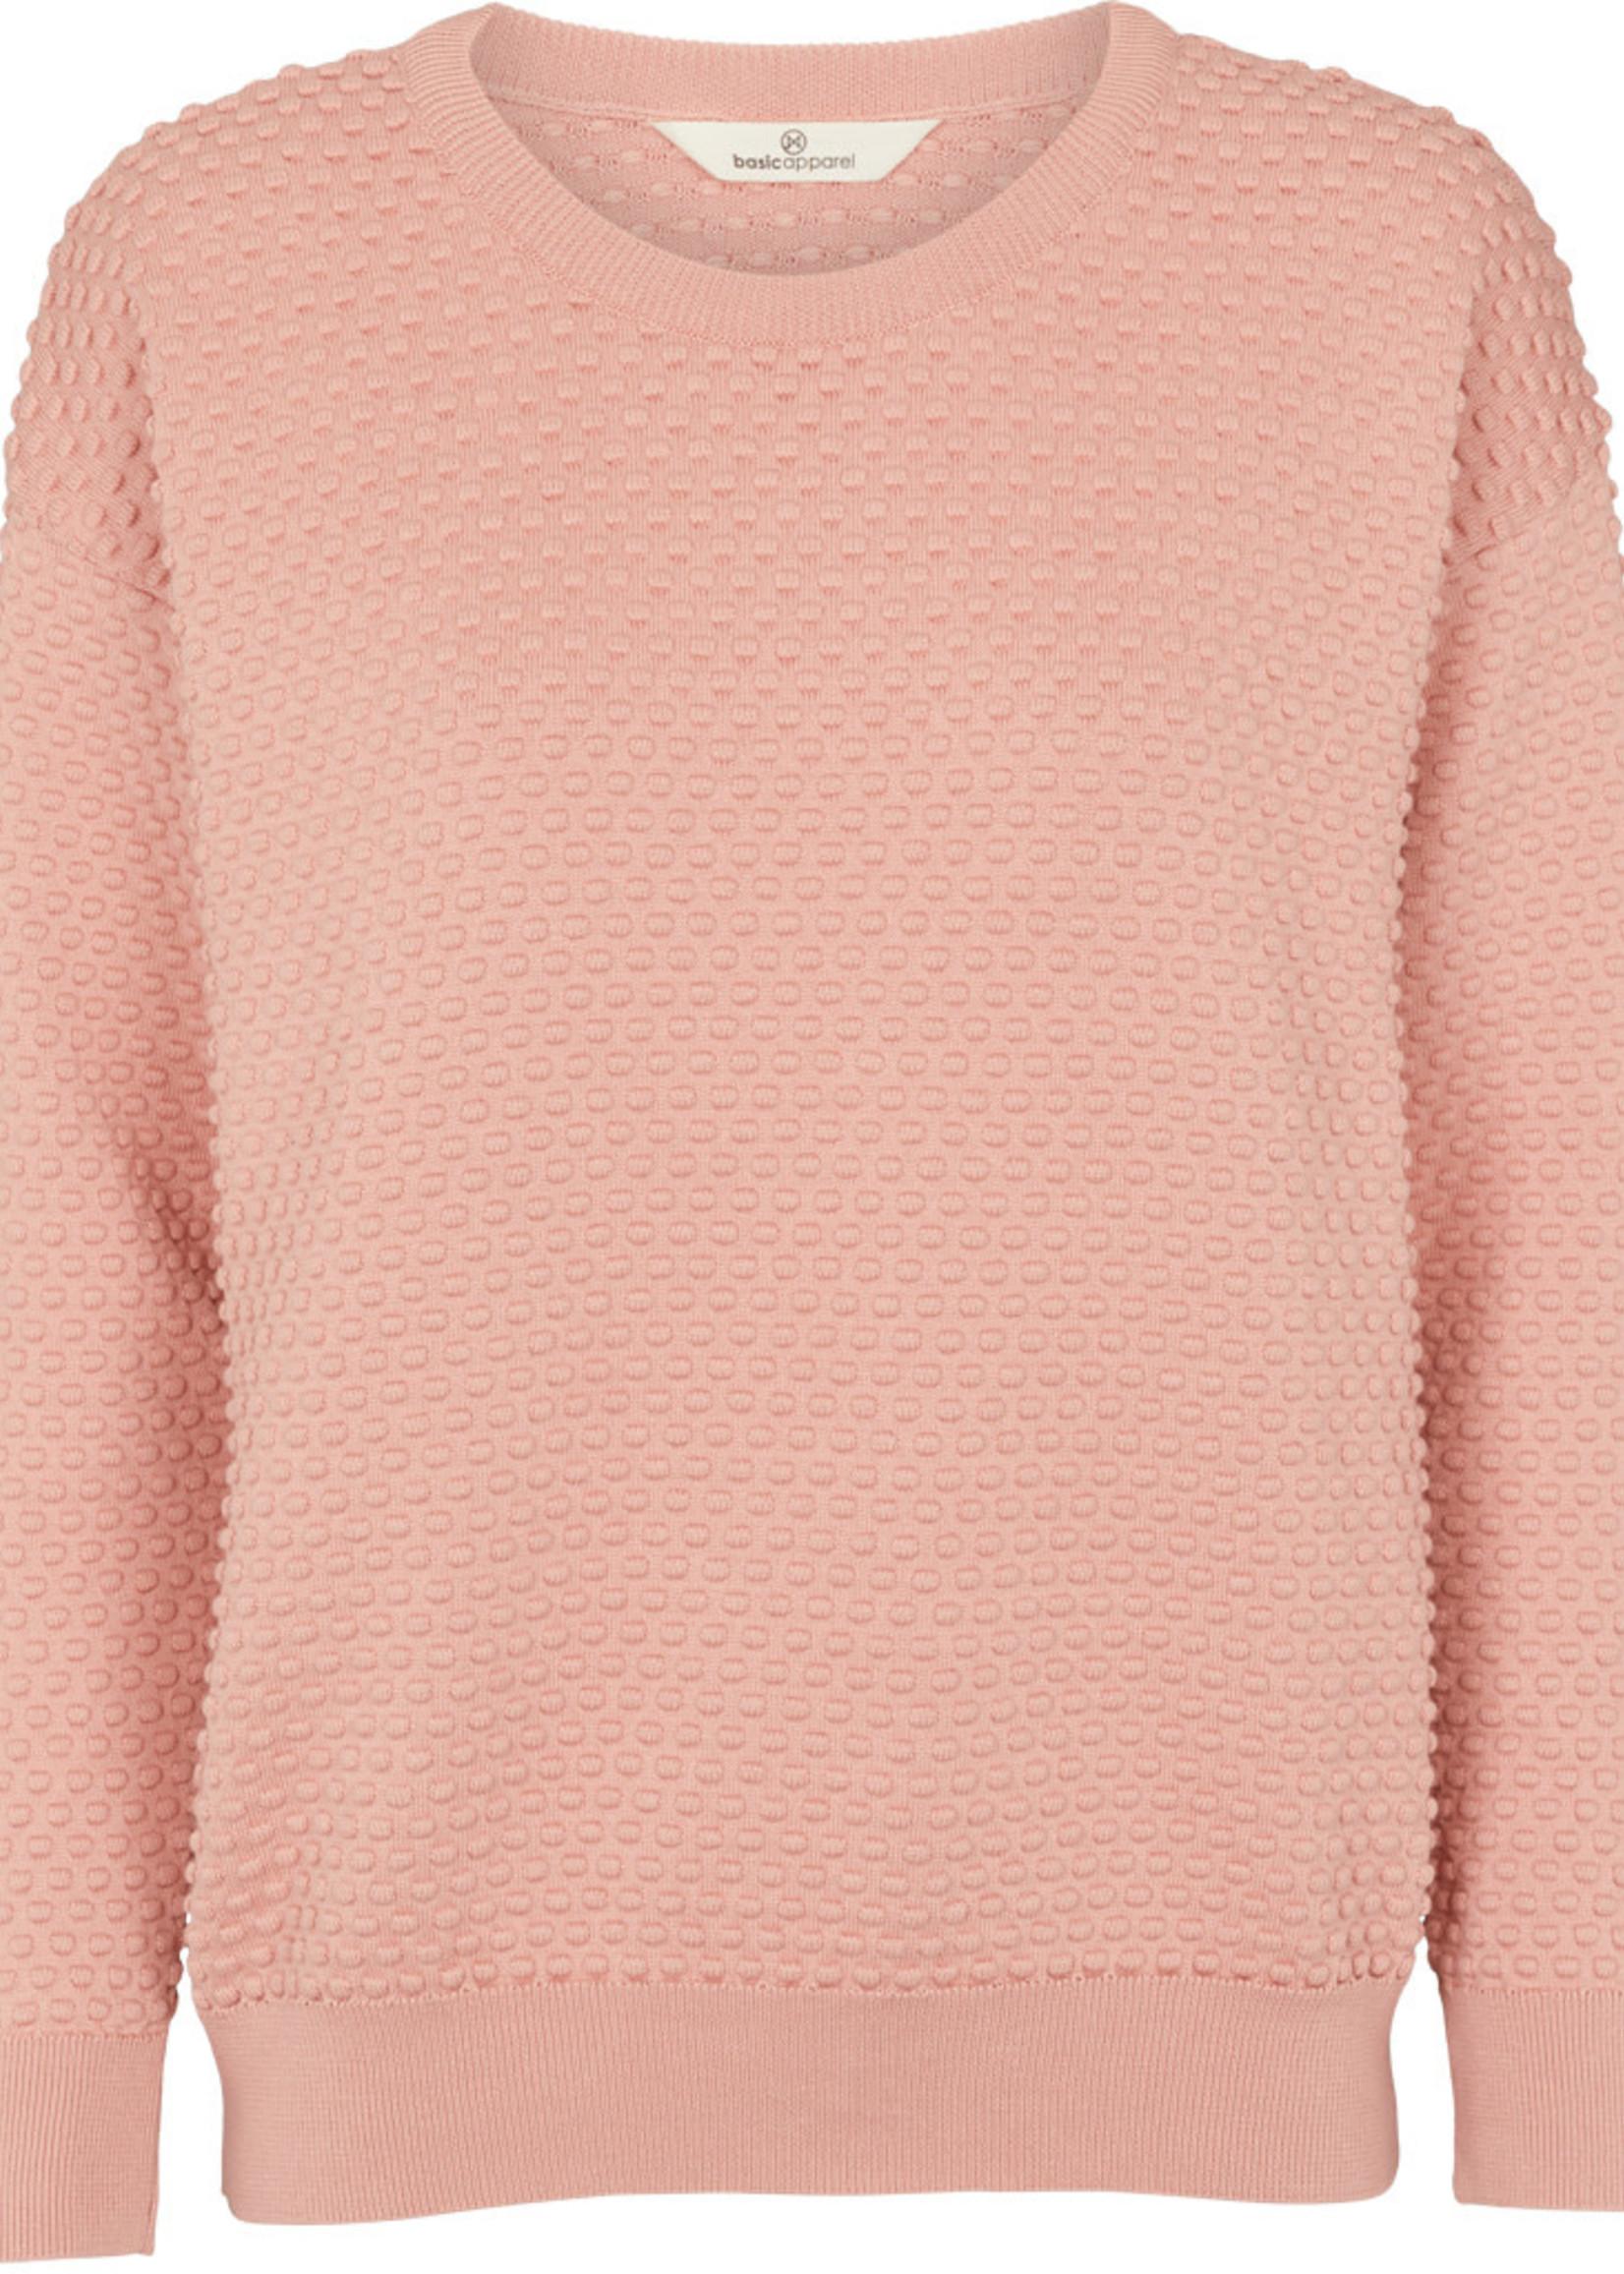 Basic Apparel Vicca Sweater